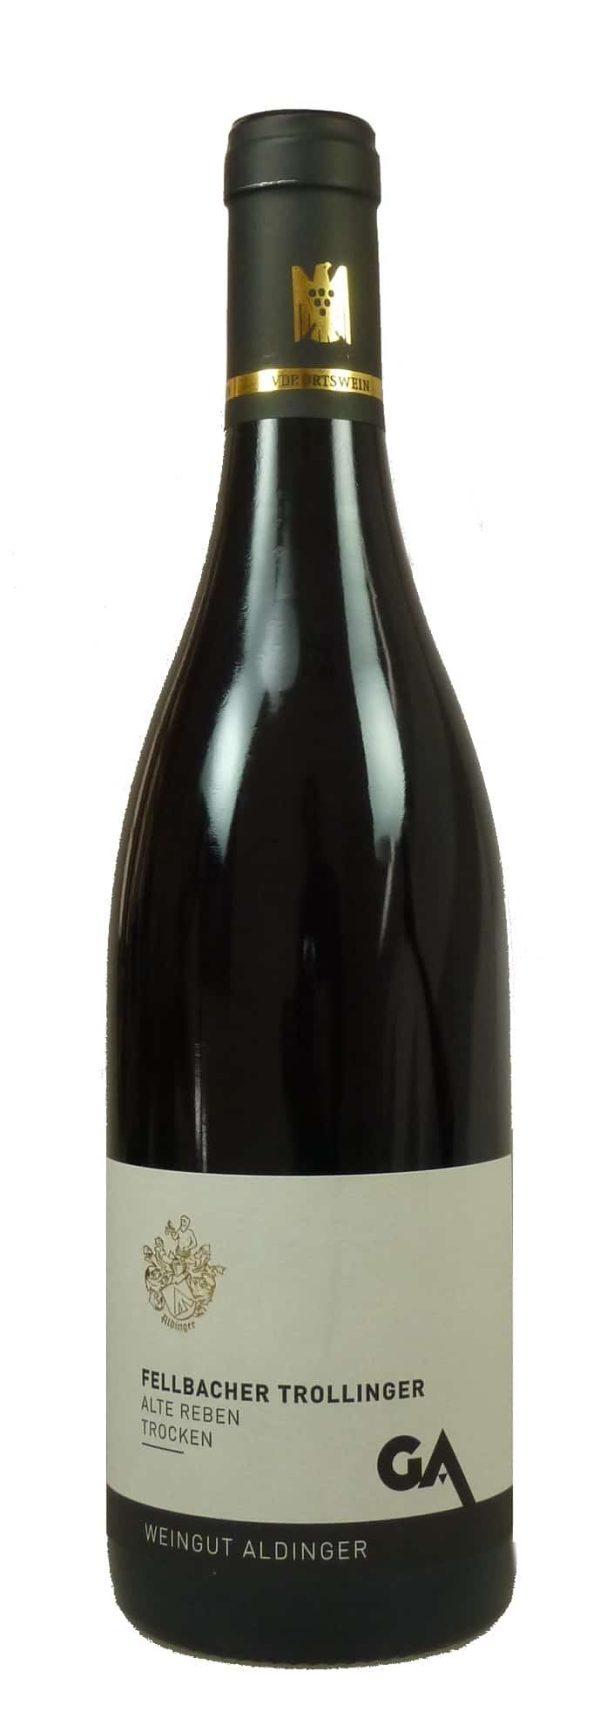 Fellbacher Trollinger Alte Reben Qualitätswein trocken 2016